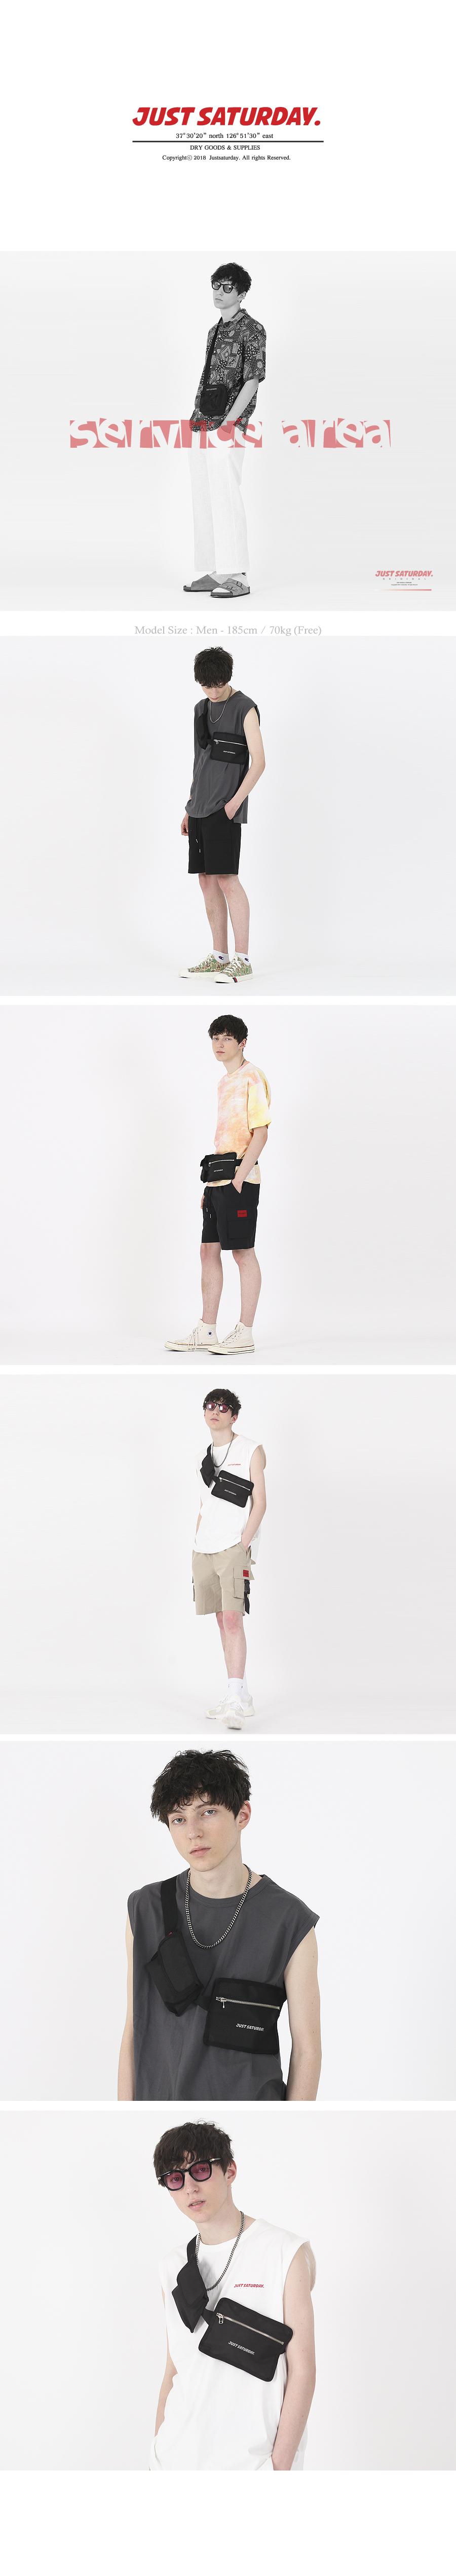 OG BELT WAIST BAG BLACK - 저스트세러데이, 29,000원, 힙색, 패브릭힙색